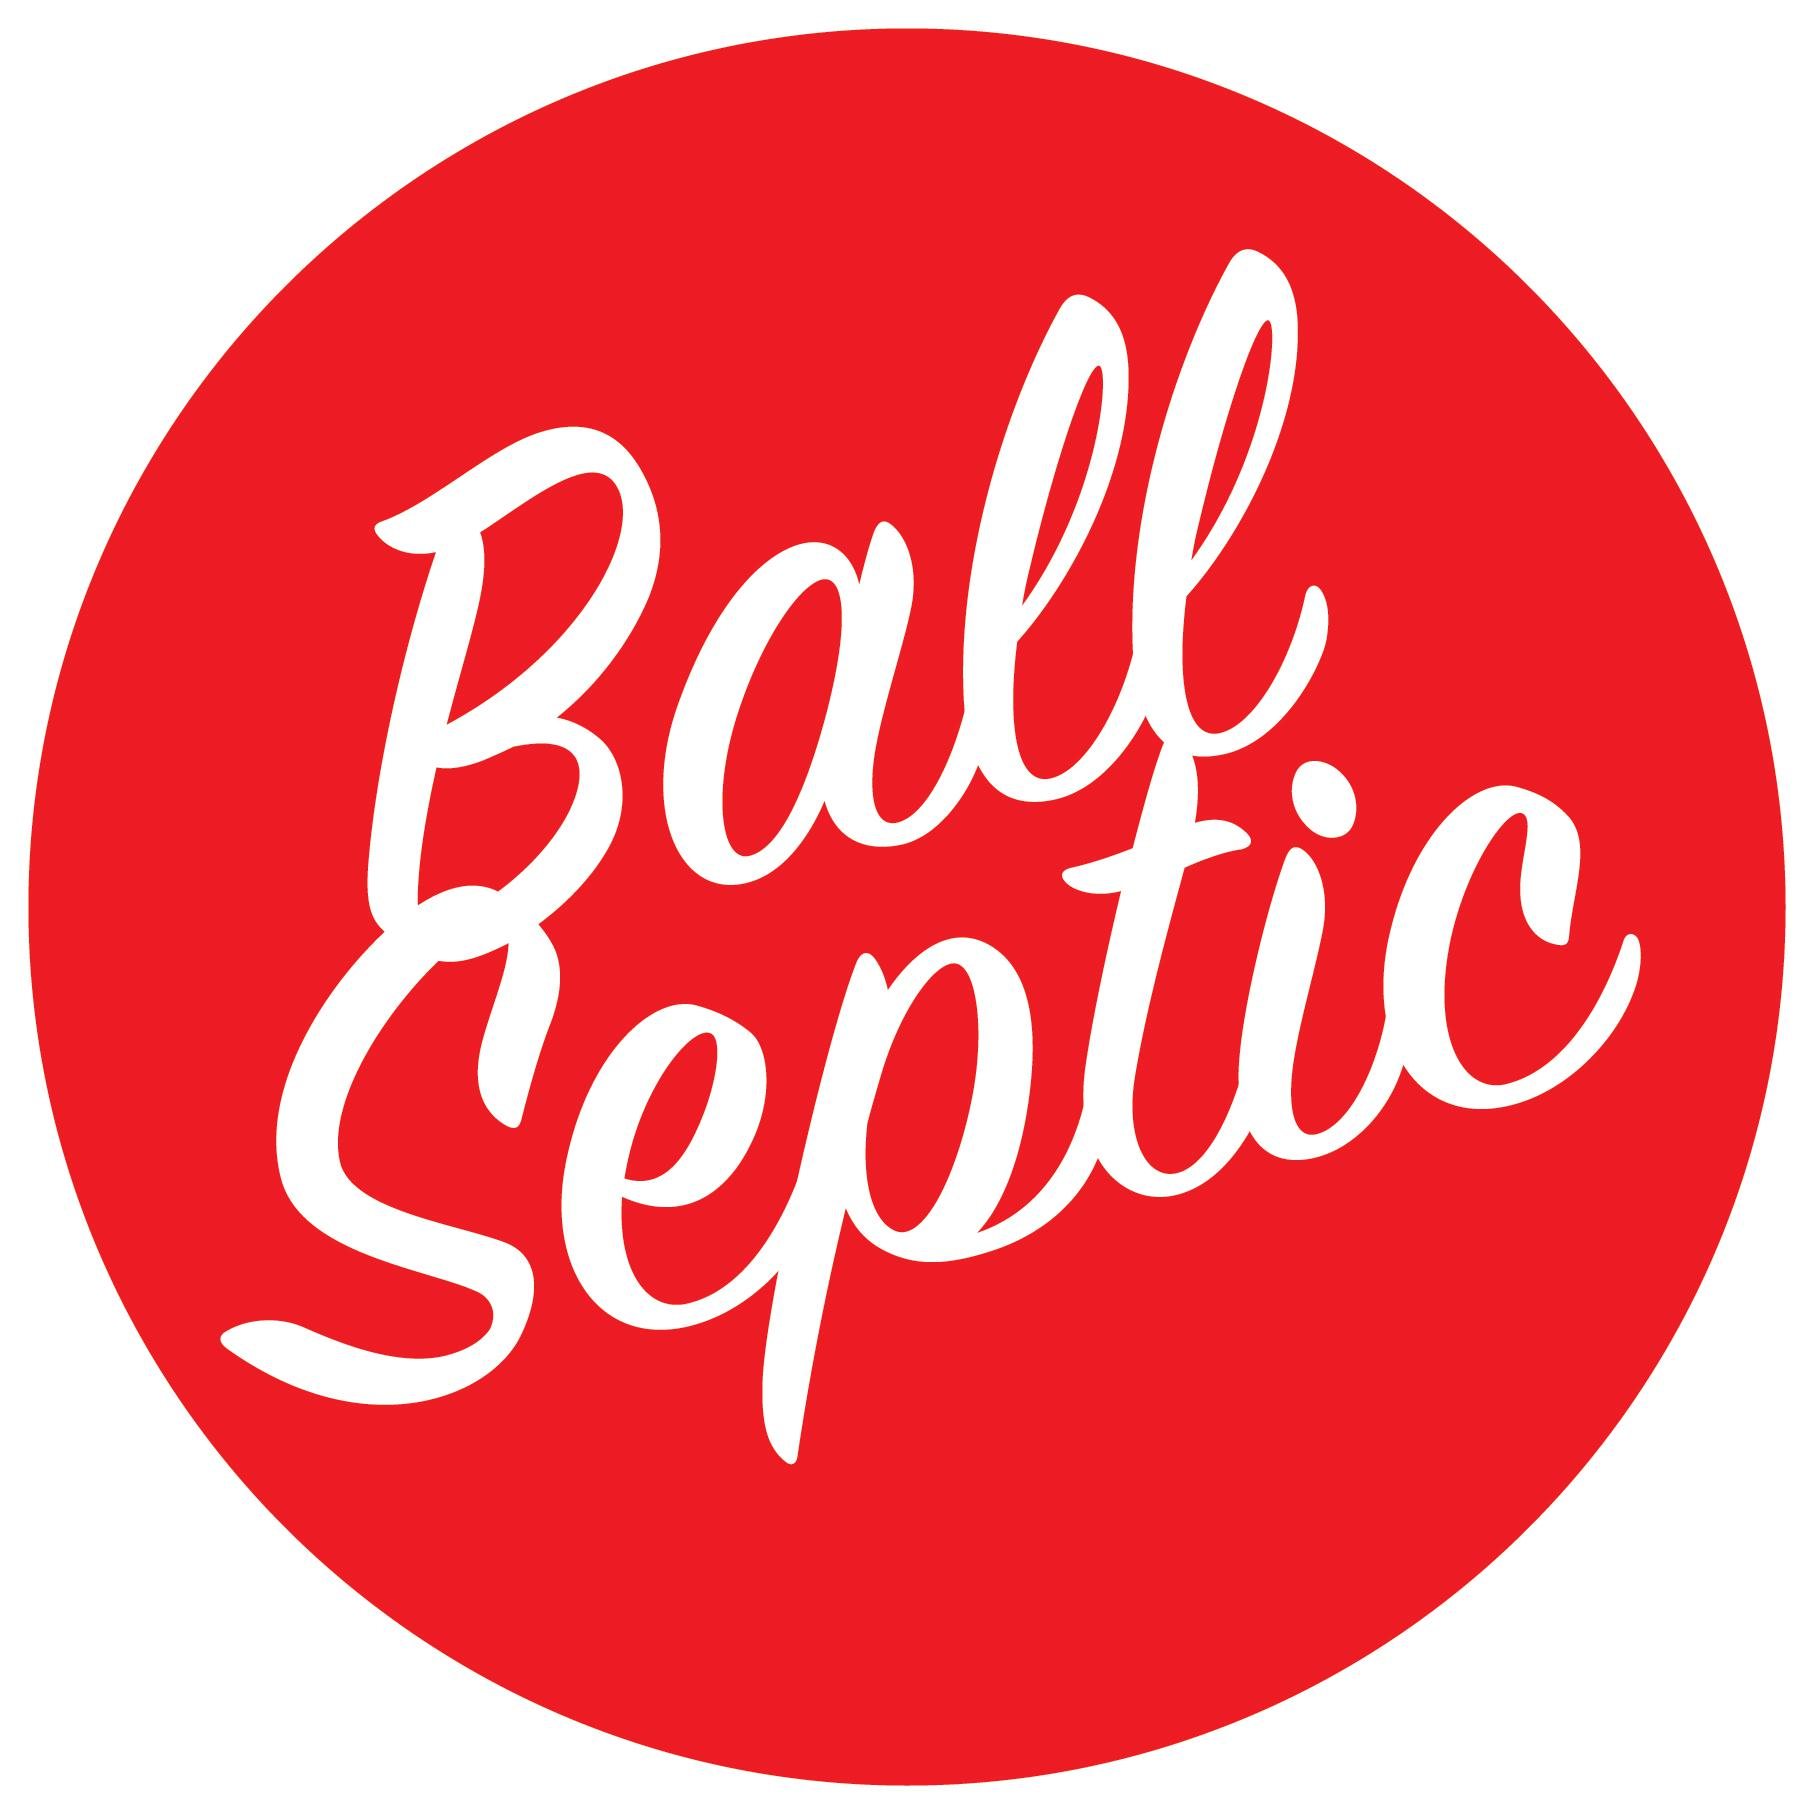 Ball Septic Tank Service